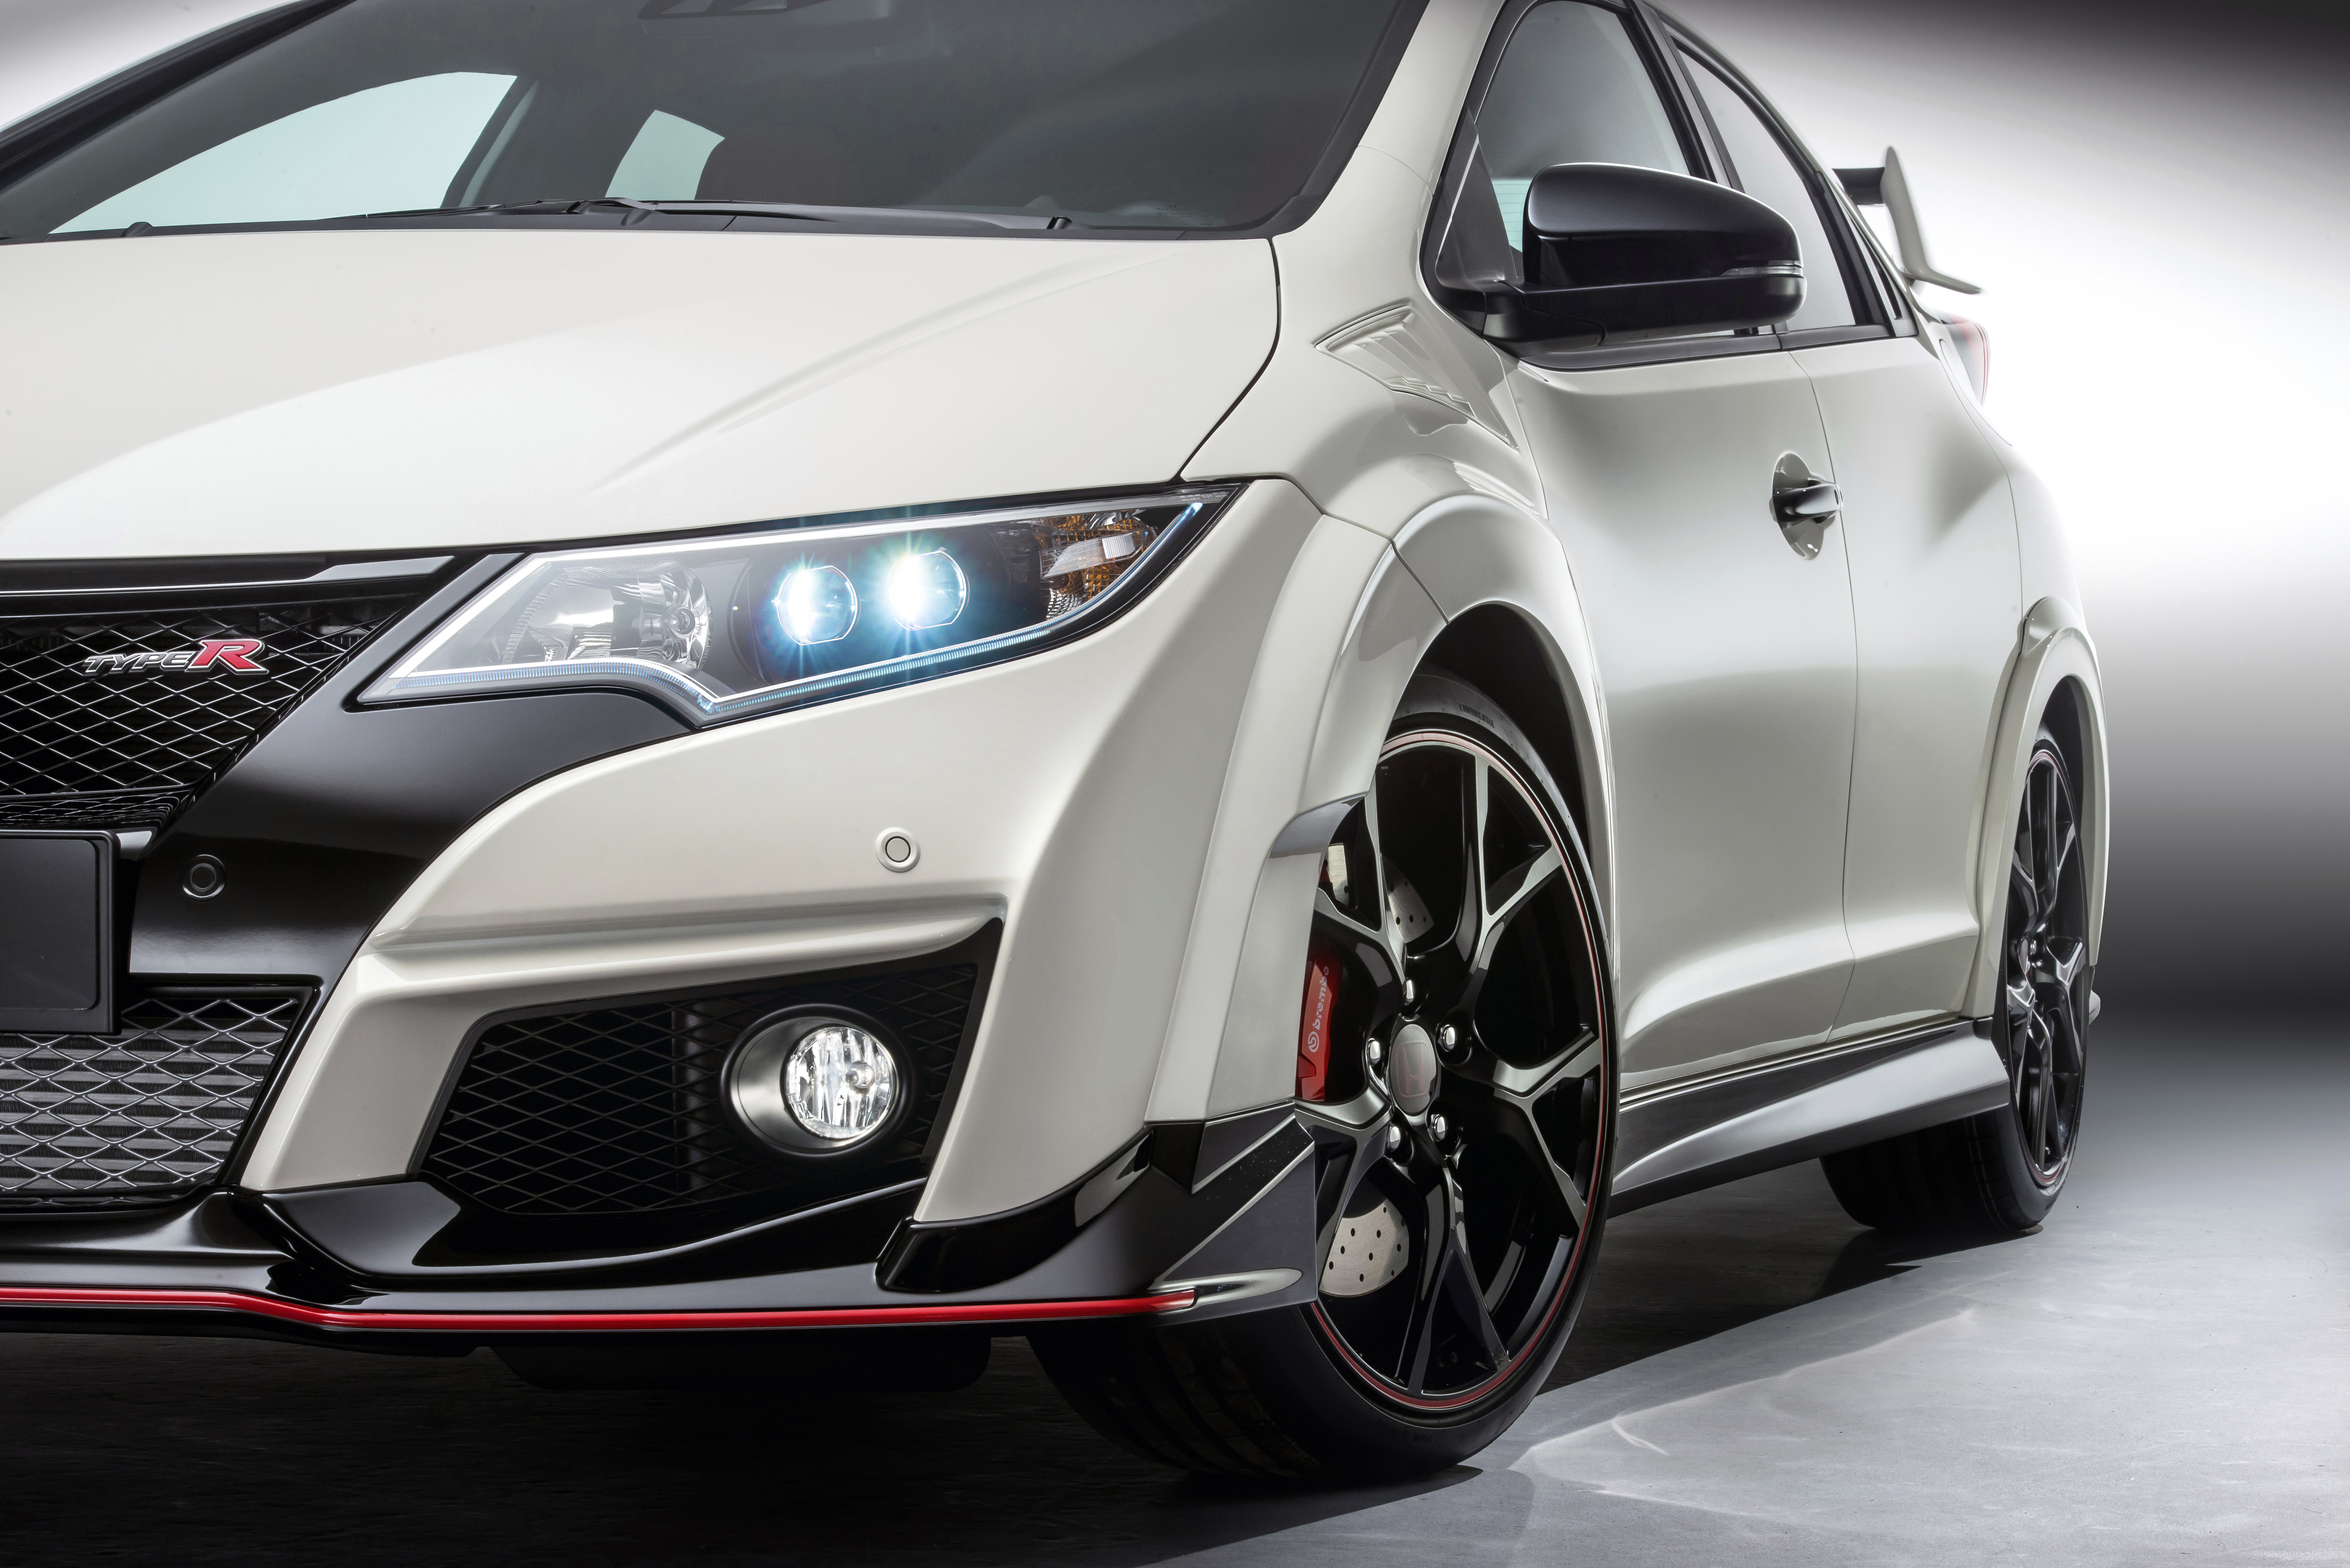 2015 Honda Civic Type R Mobile Wallpaper 4149   Grivucom 7360x4912